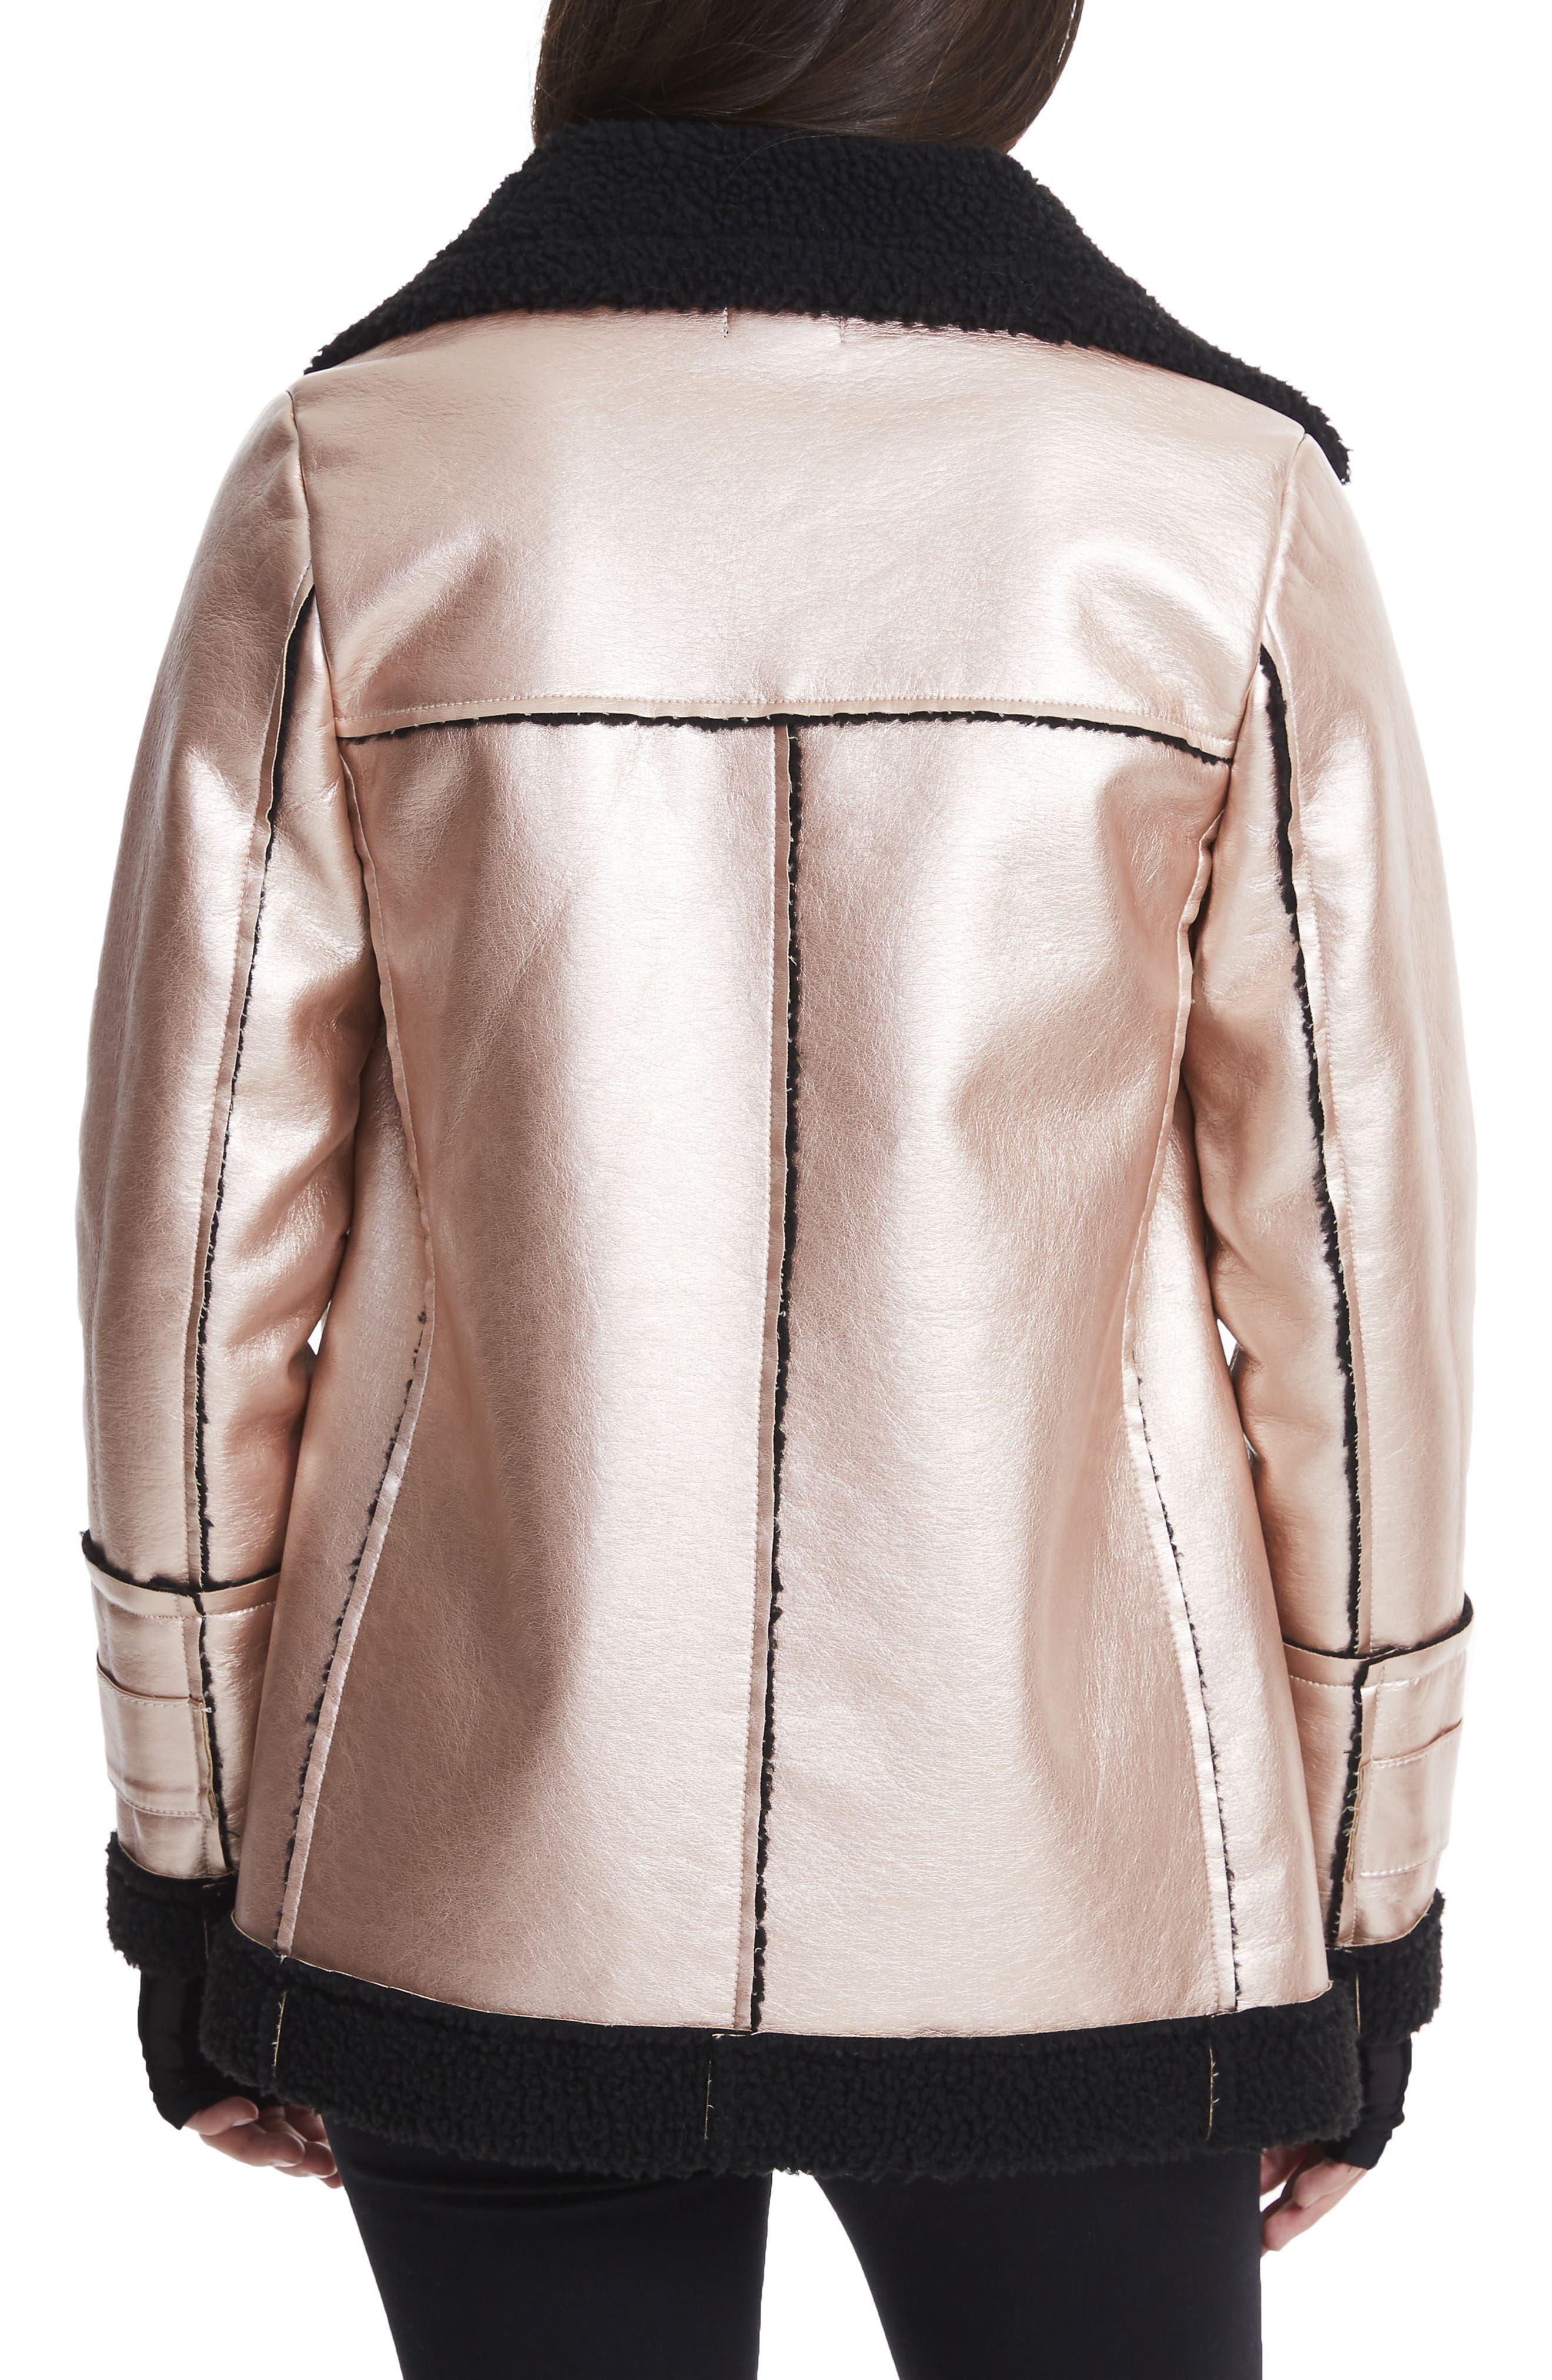 Ophelia Oversize Faux Shearling Jacket,                             Alternate thumbnail 2, color,